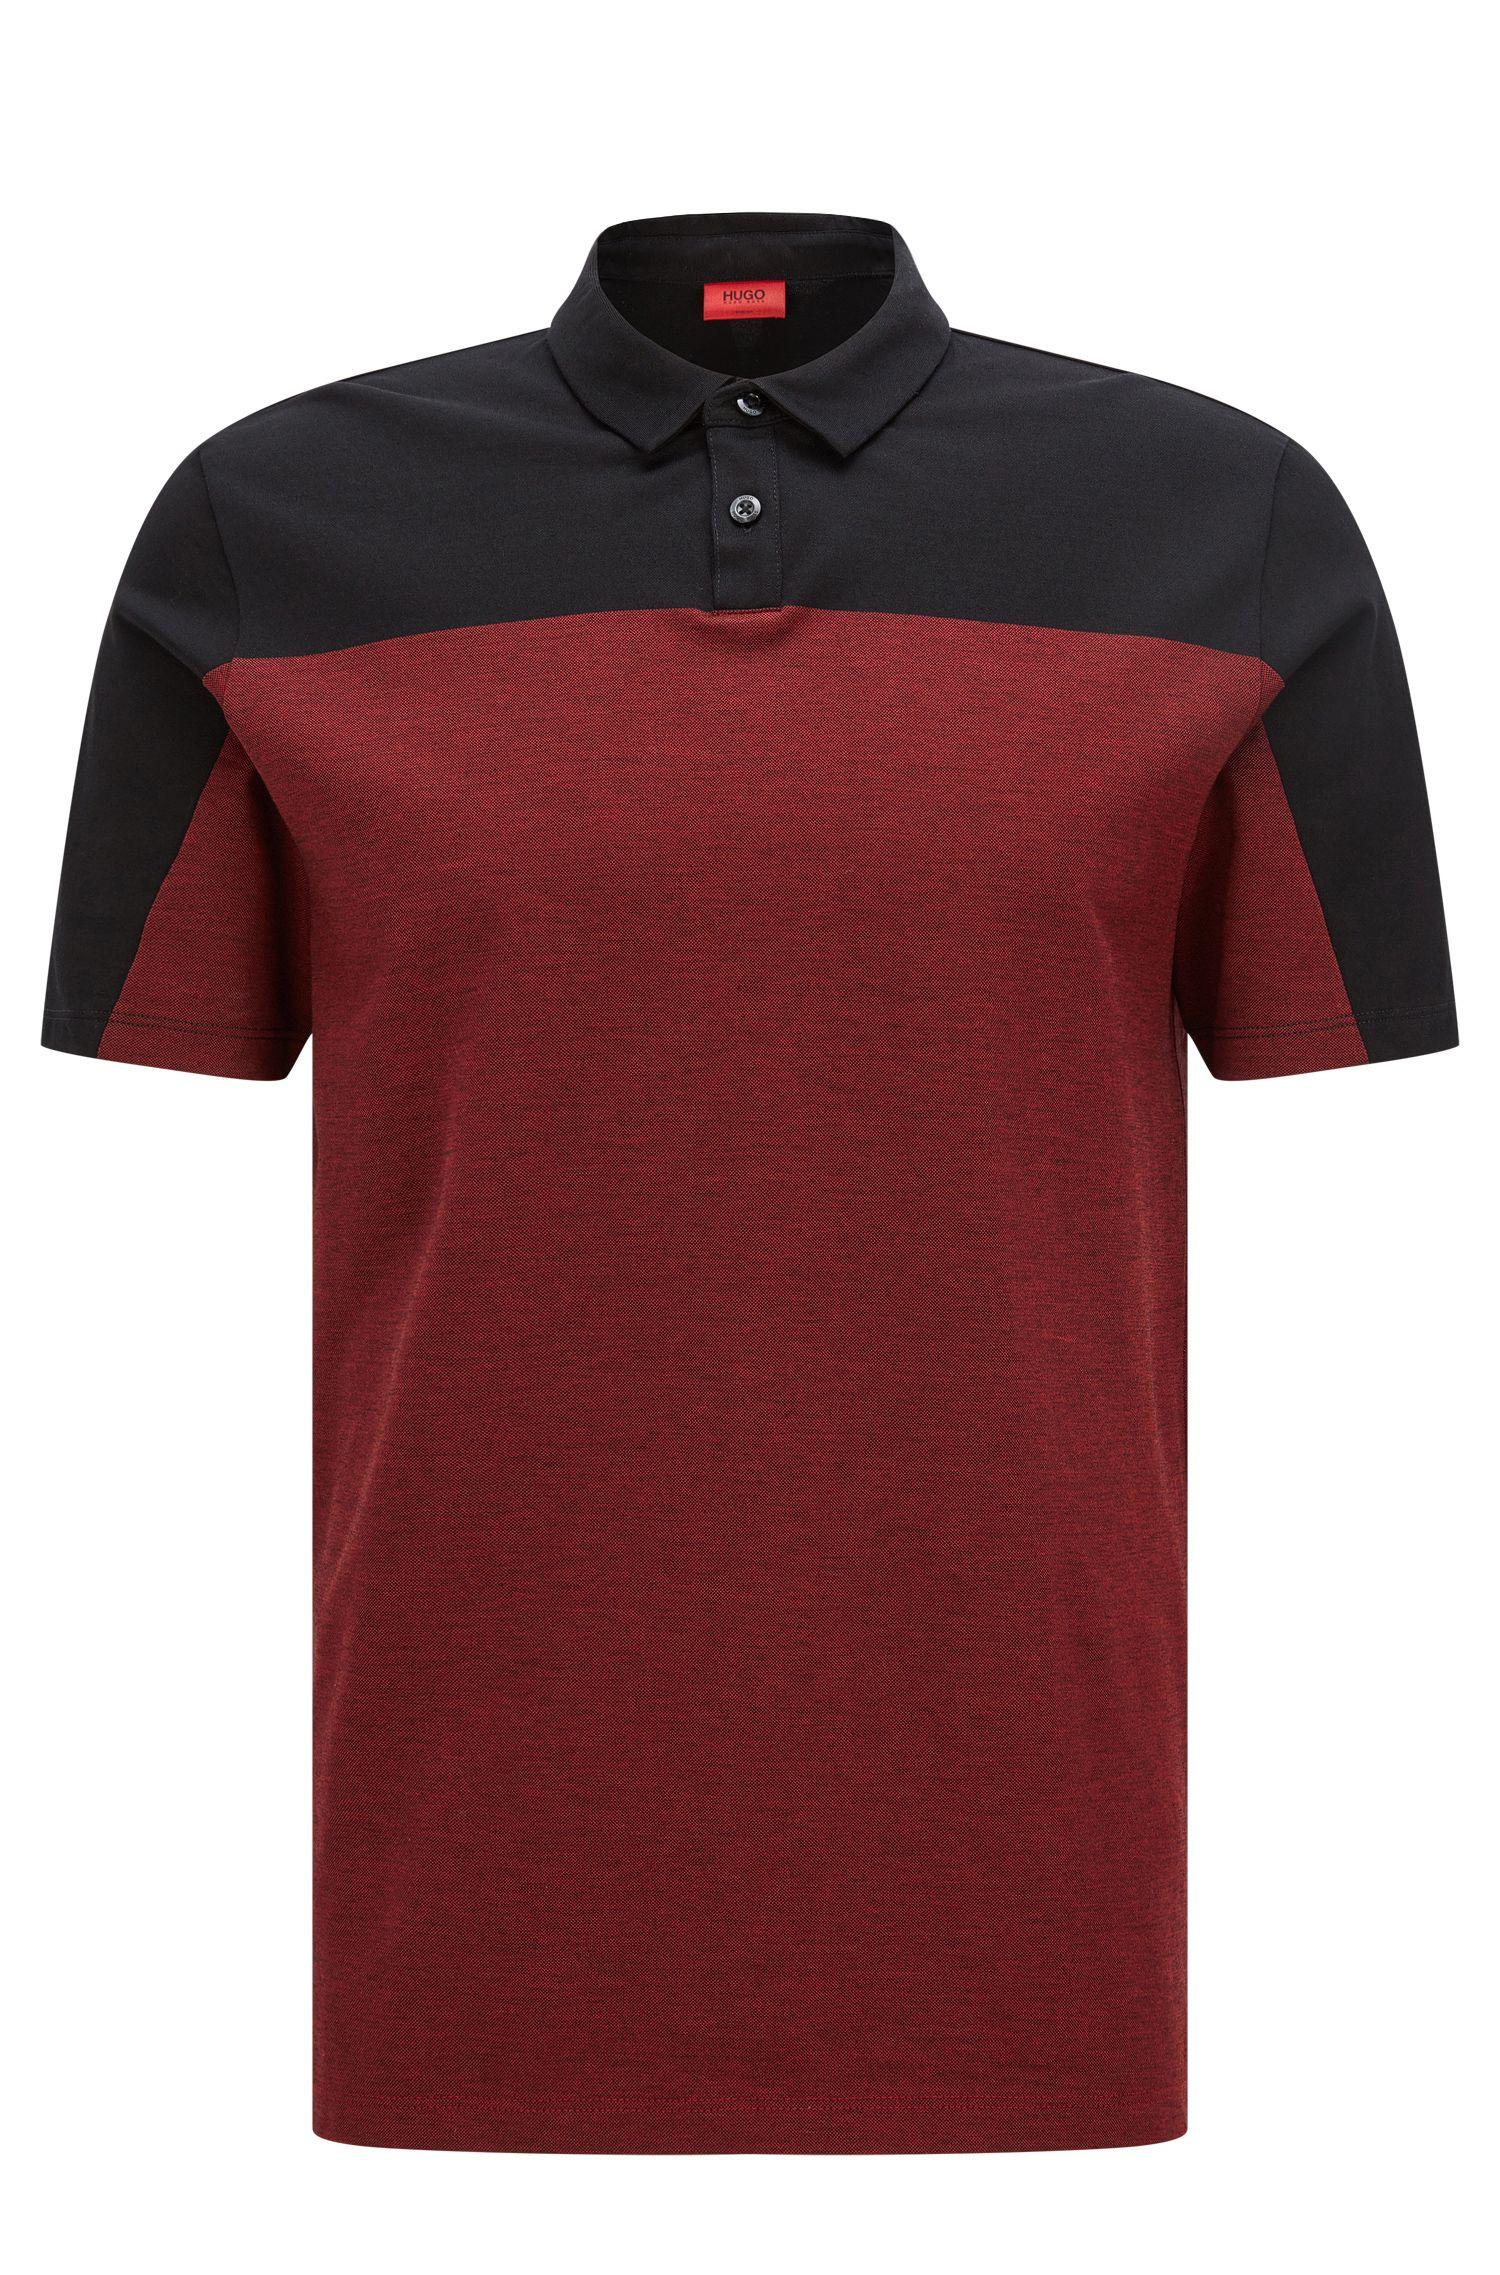 Colorblock Cotton Polo, Slim Fit   Dormfort , Black